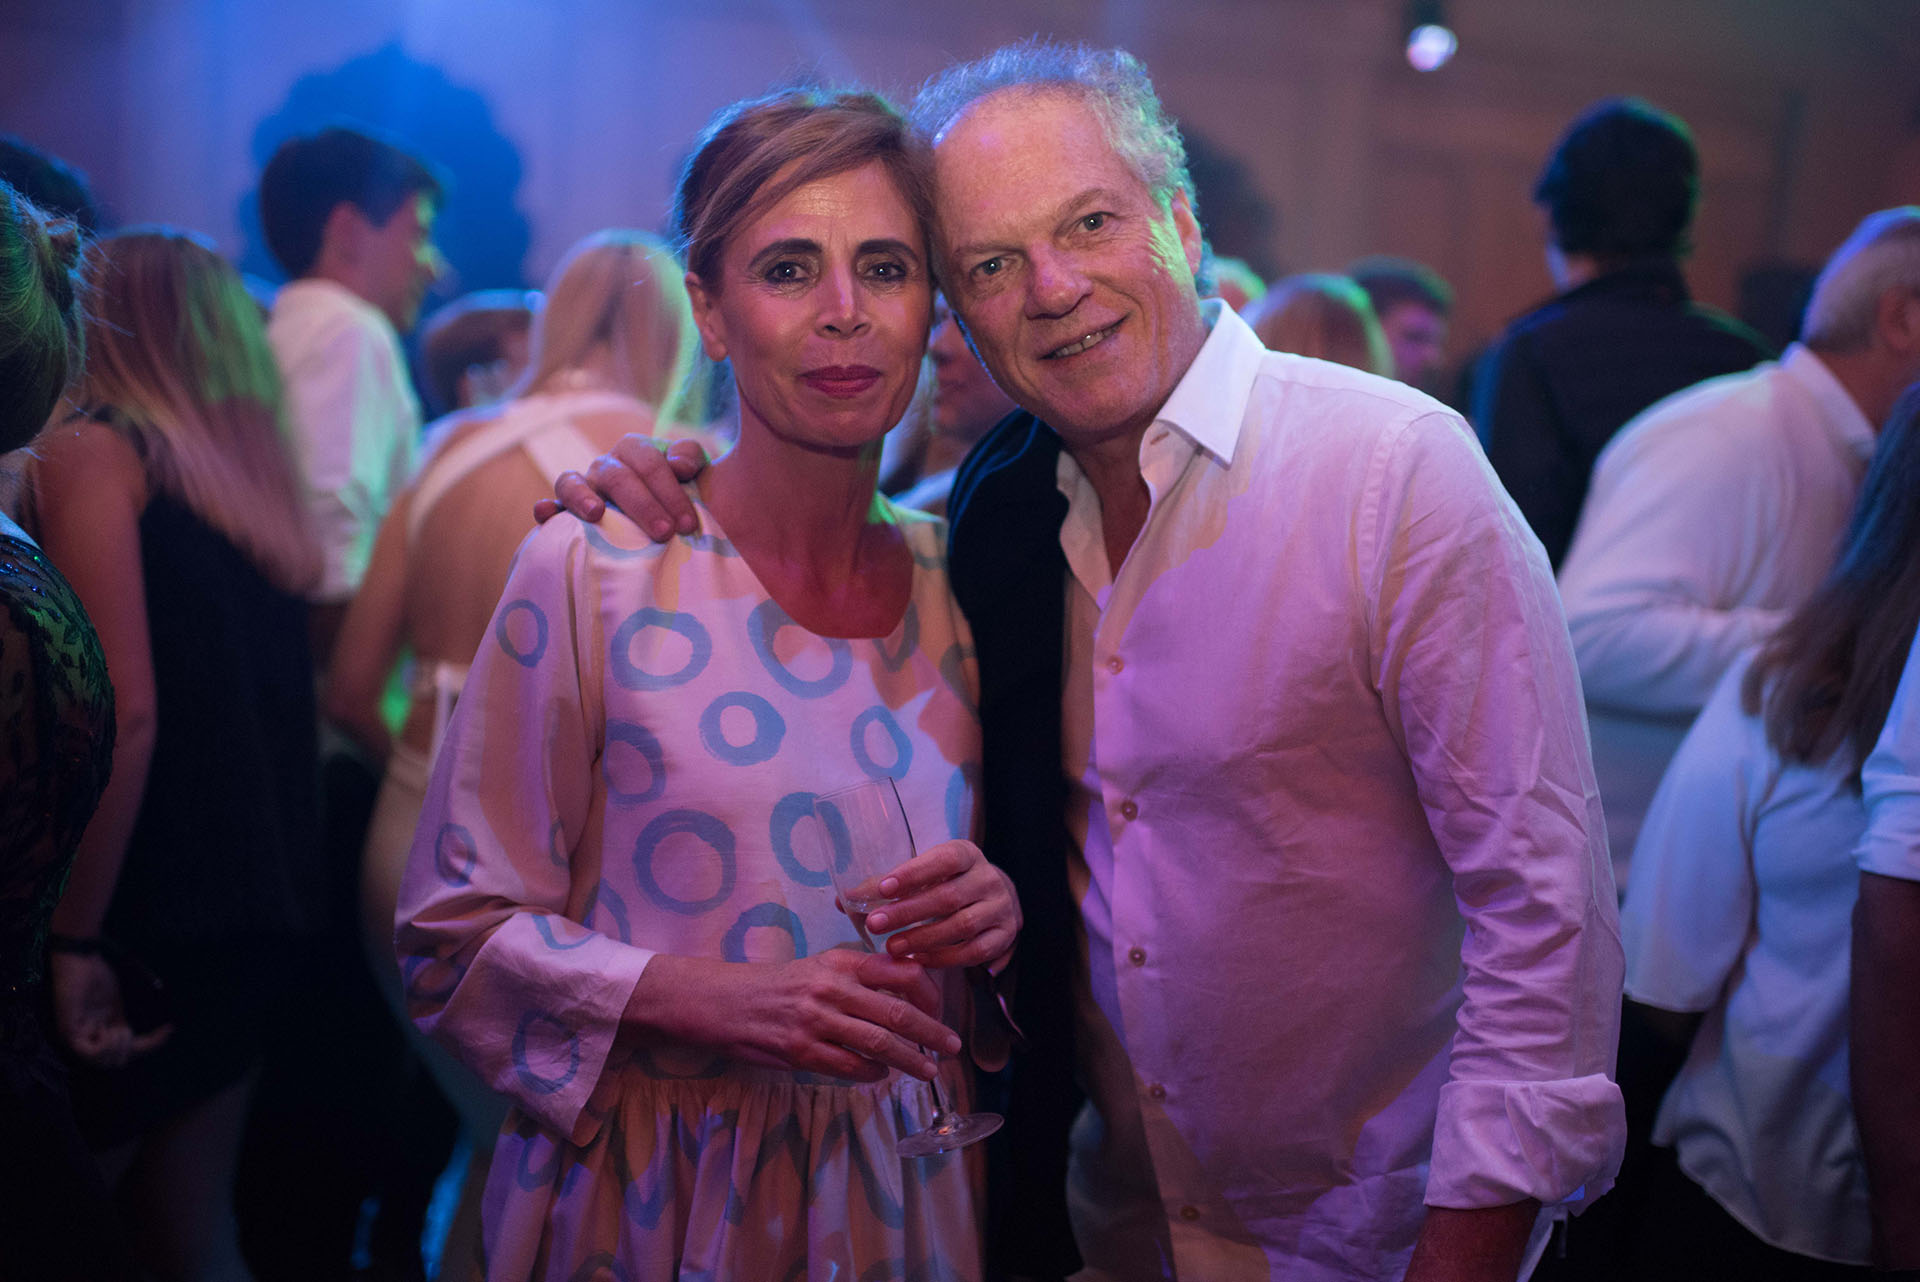 La diseñadora Ágatha Ruíz de la Prada junto al empresario Daniel Sielecki